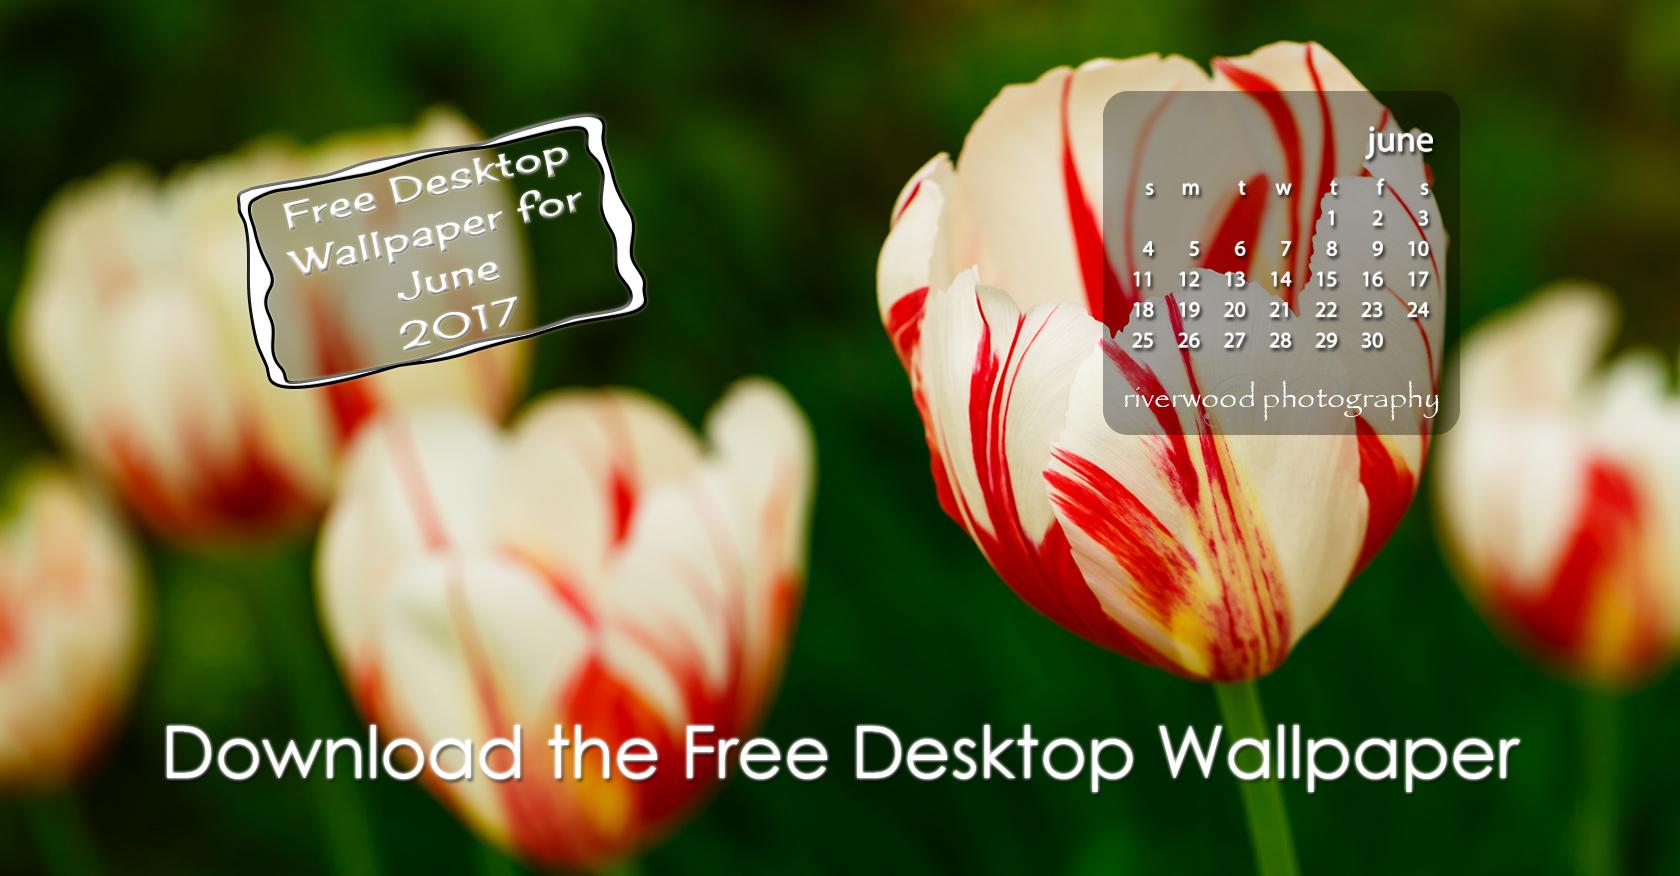 Free Desktop Wallpaper for June 2017